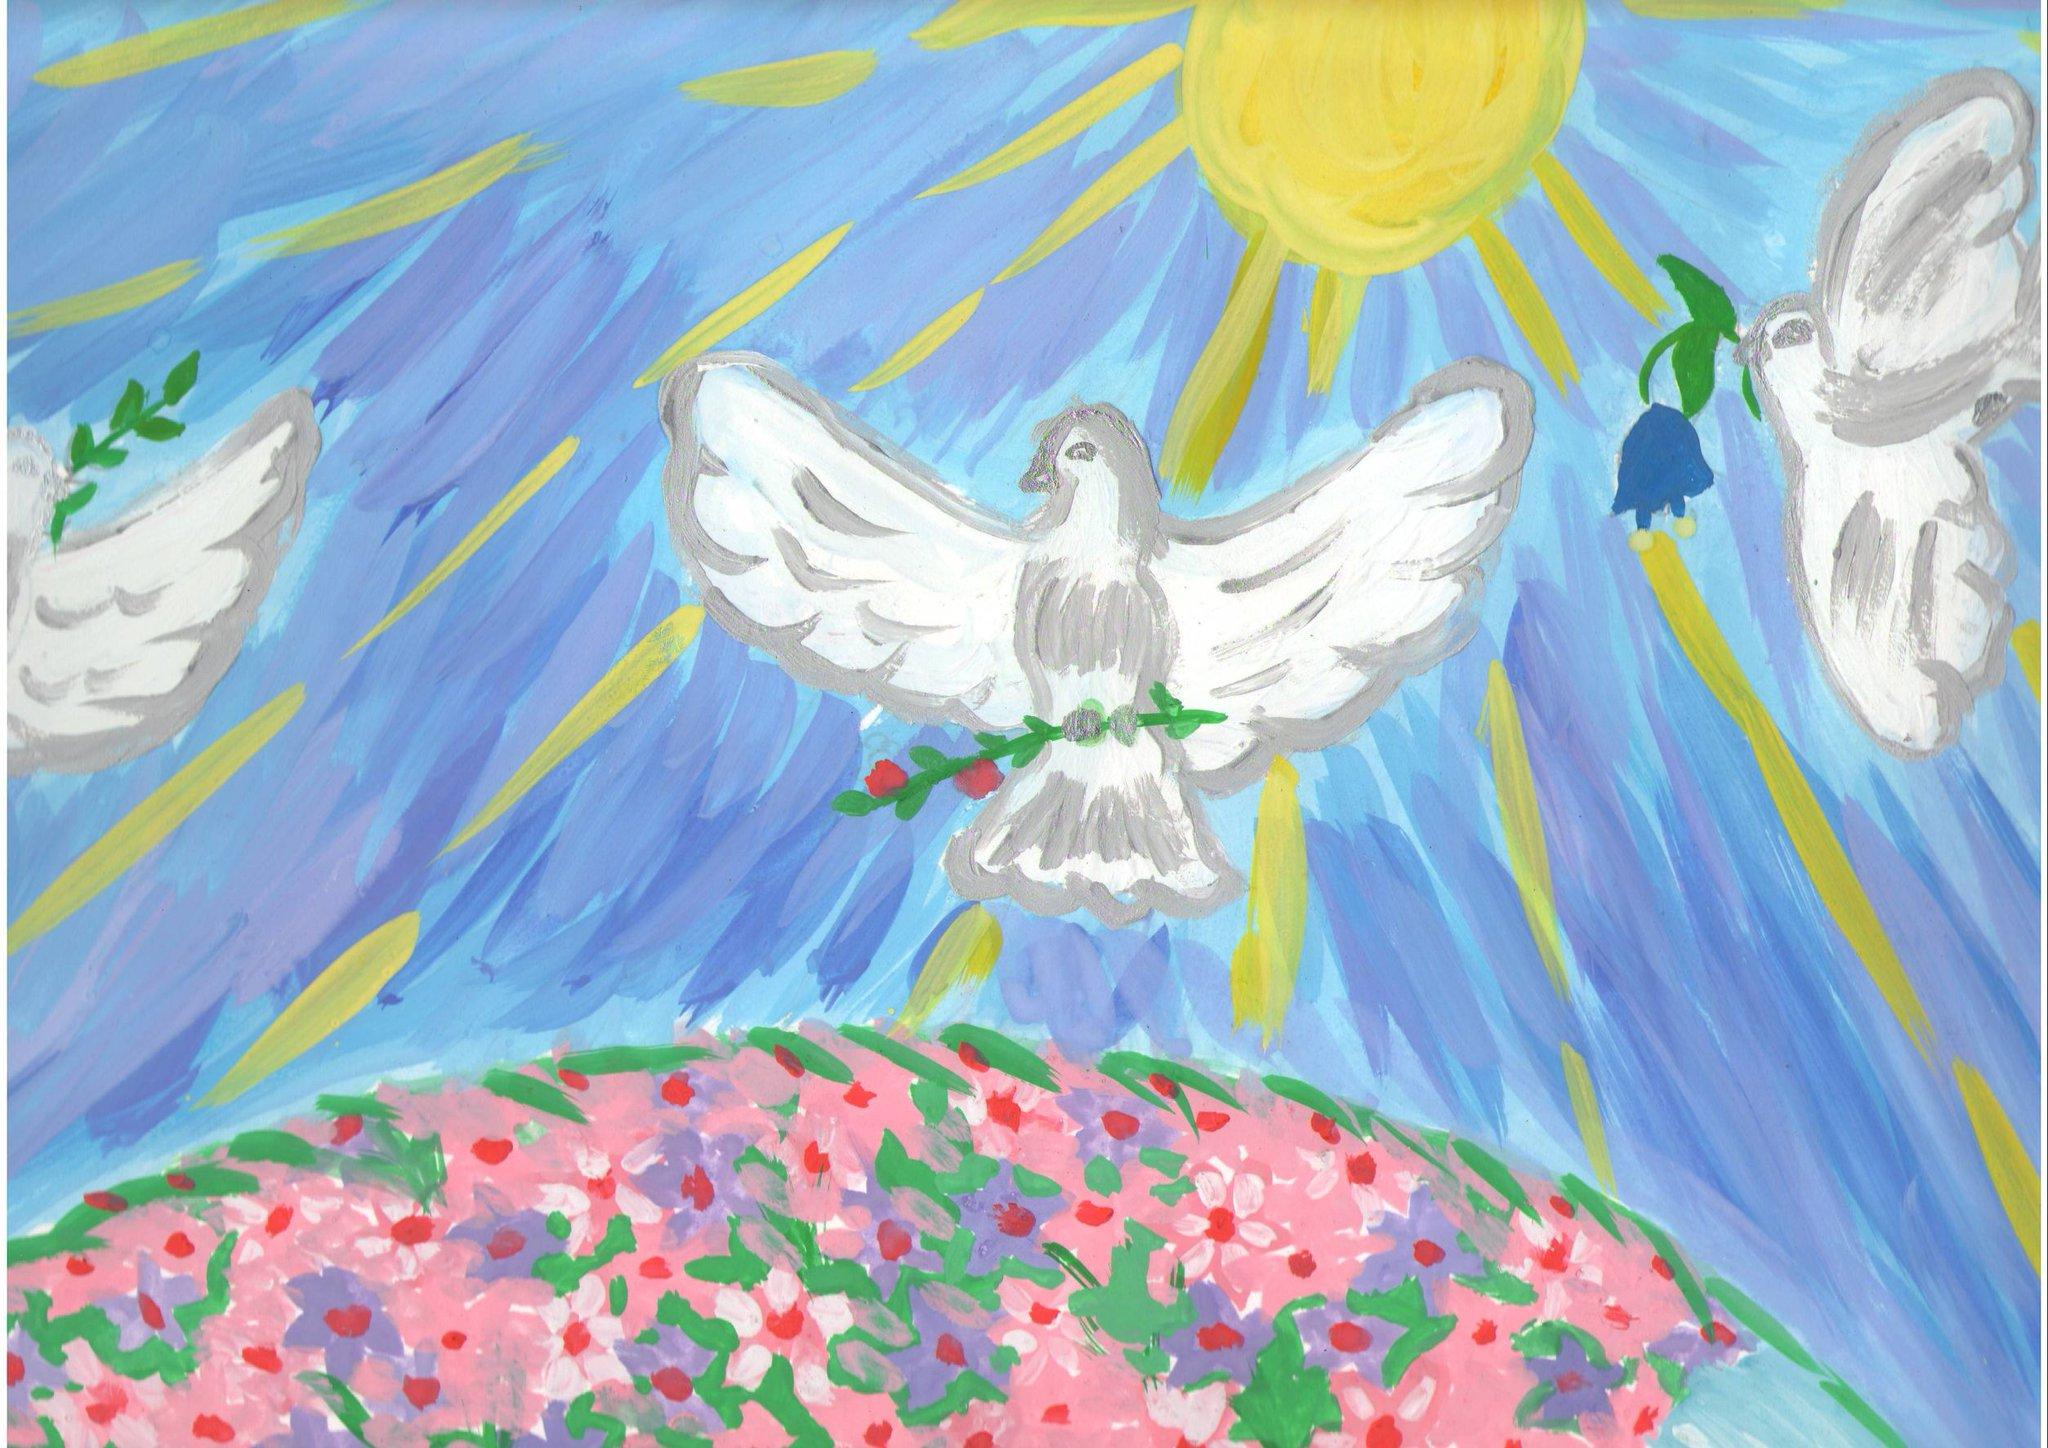 ради мира на земле картинки человек